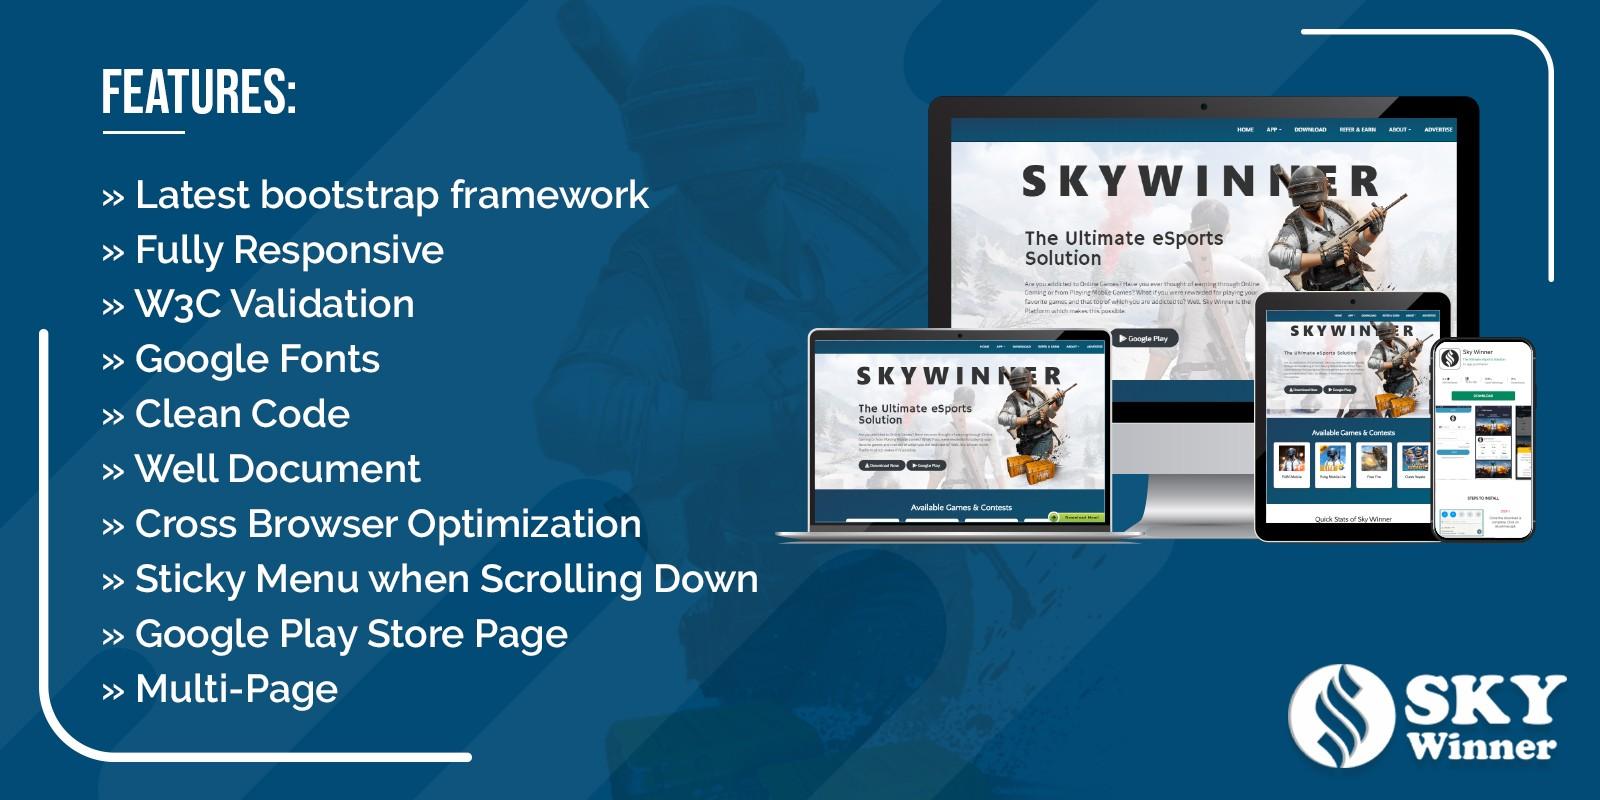 Sky Winner - Tournament Application Landing Page